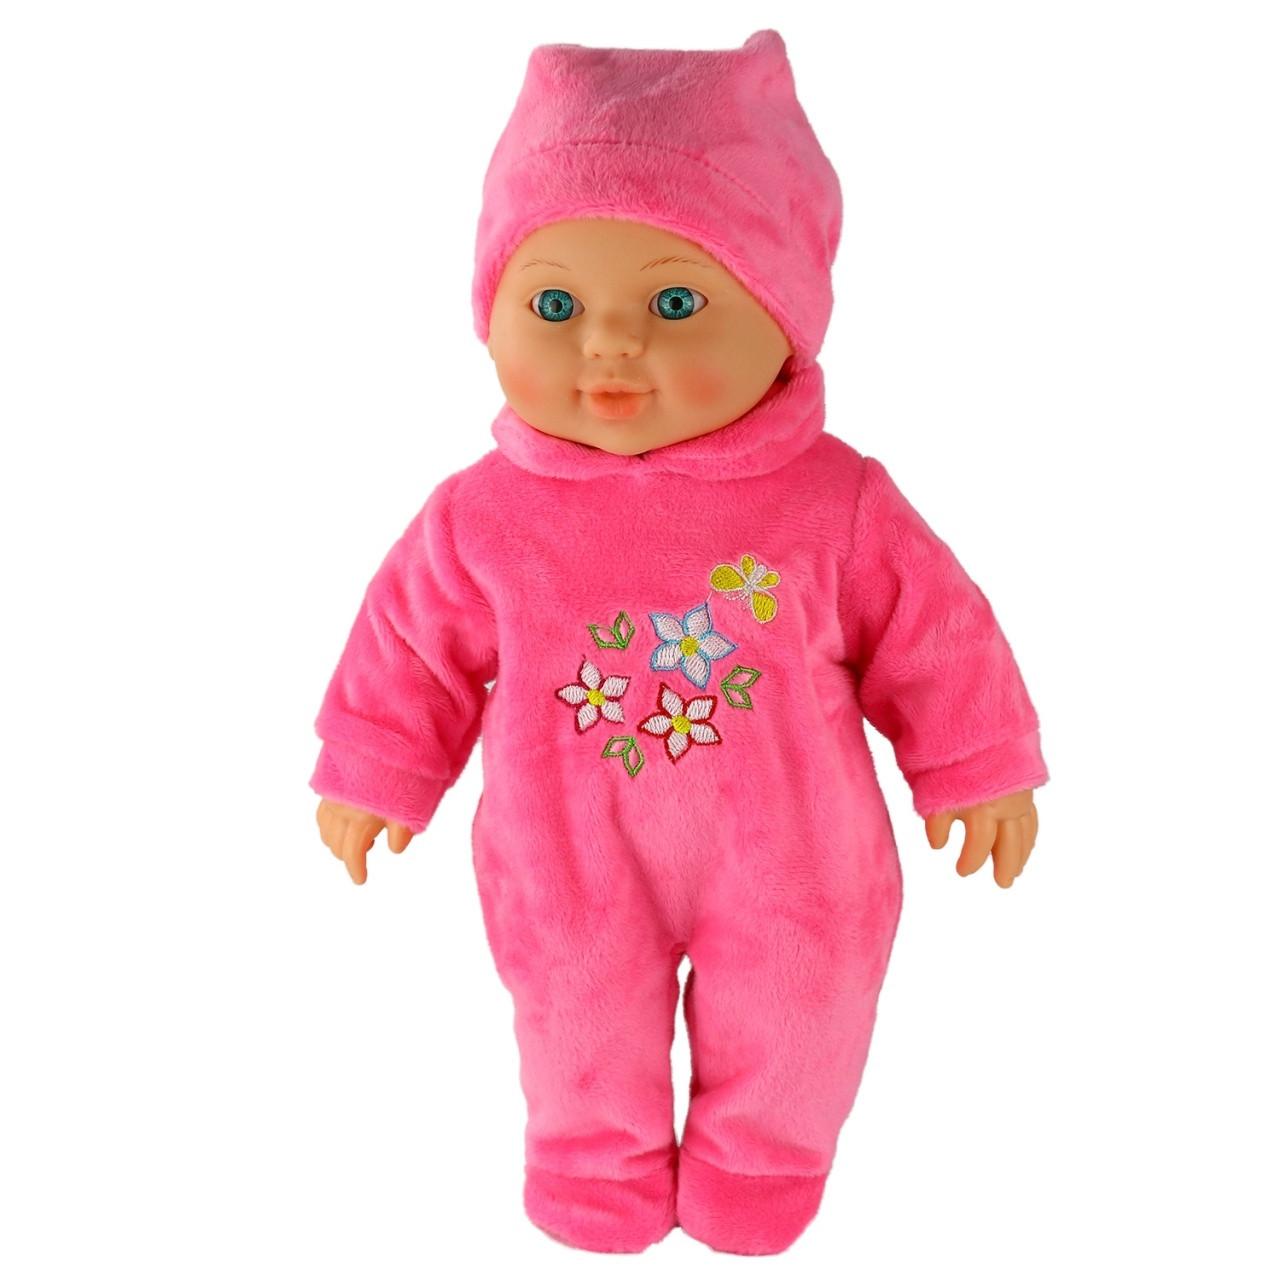 Весна Кукла Малышка Цветочки, 30 см